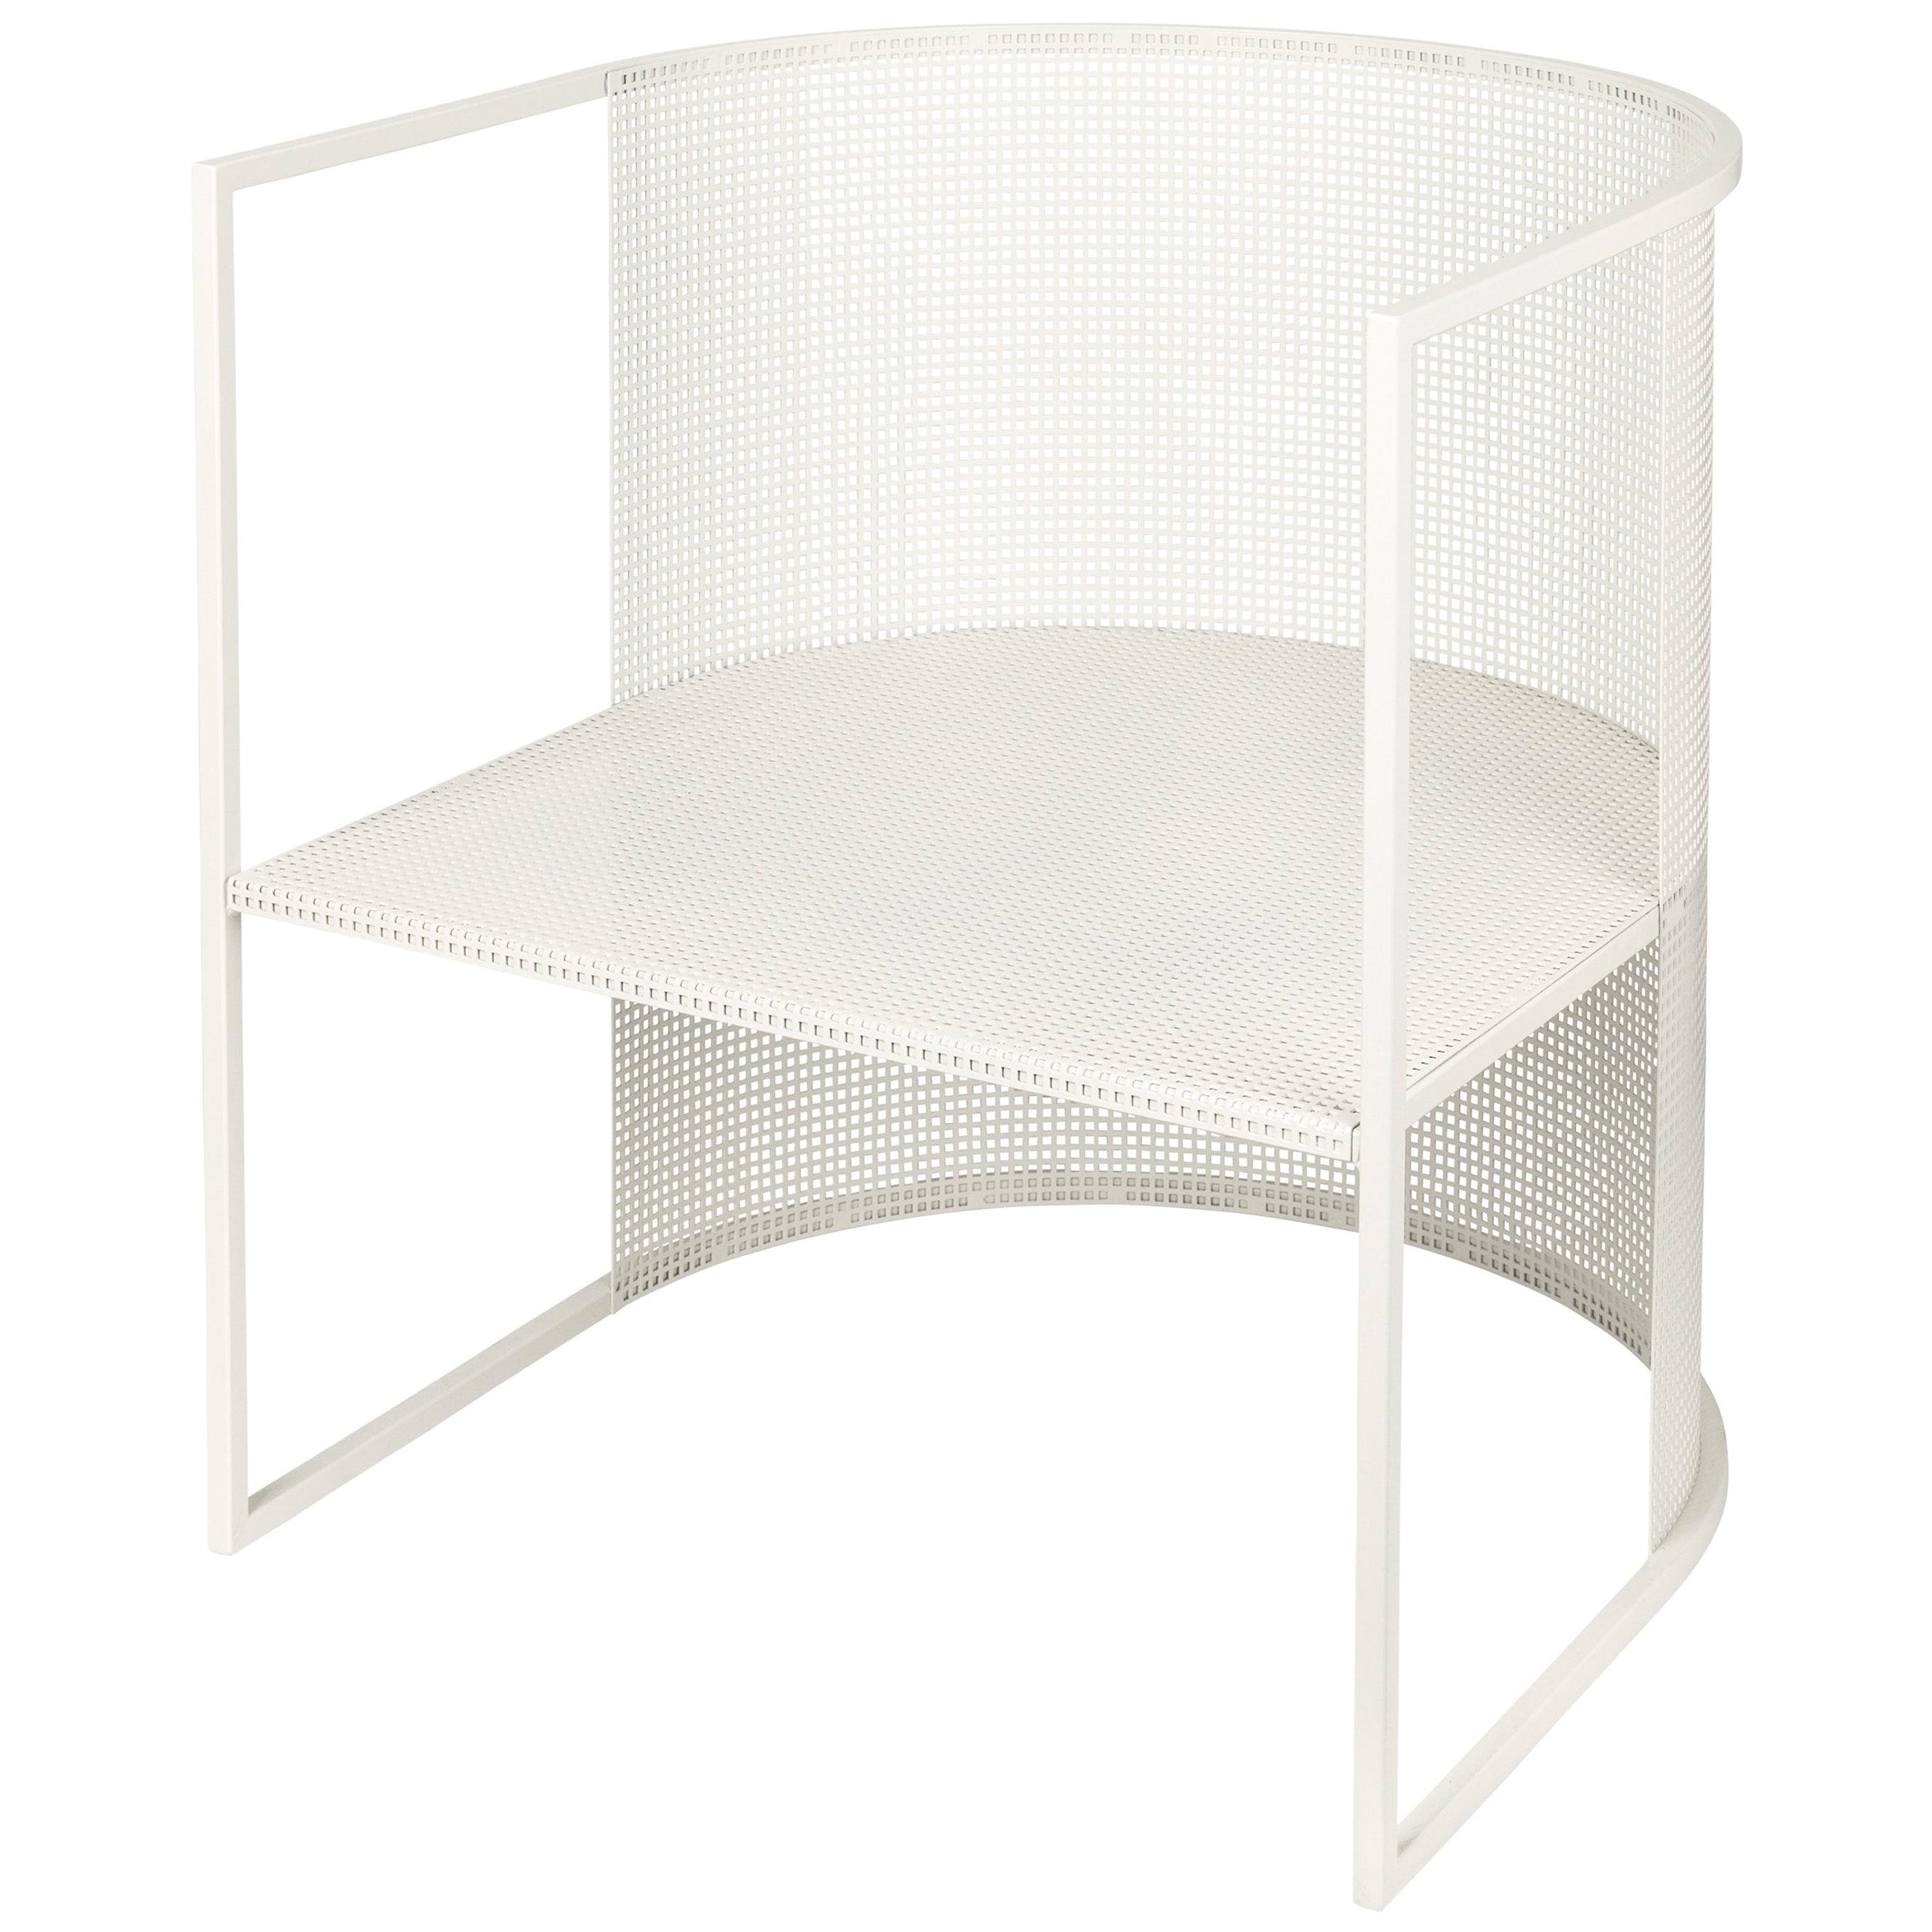 Steel Bahaus Lounge Chair by Kristina Dam Studio